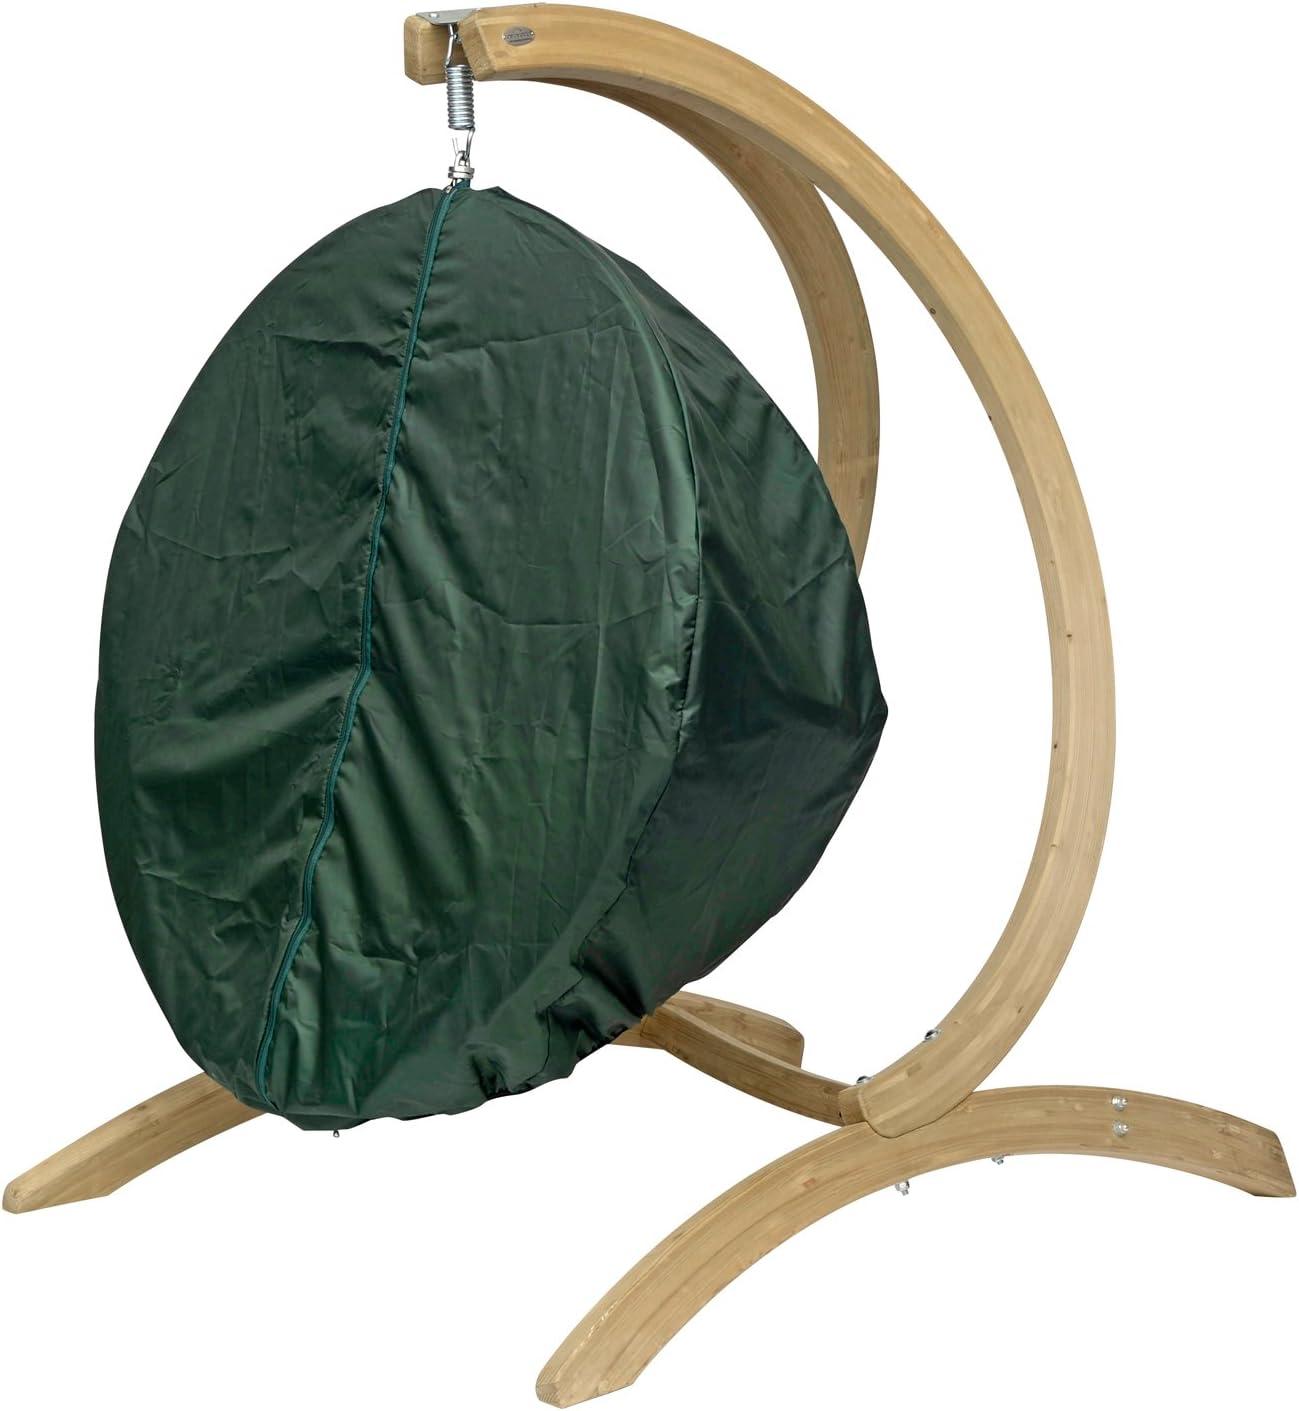 69x118x121 cm as Hammock AZ-2030825 Telo Protettivo Globo Cover Verde